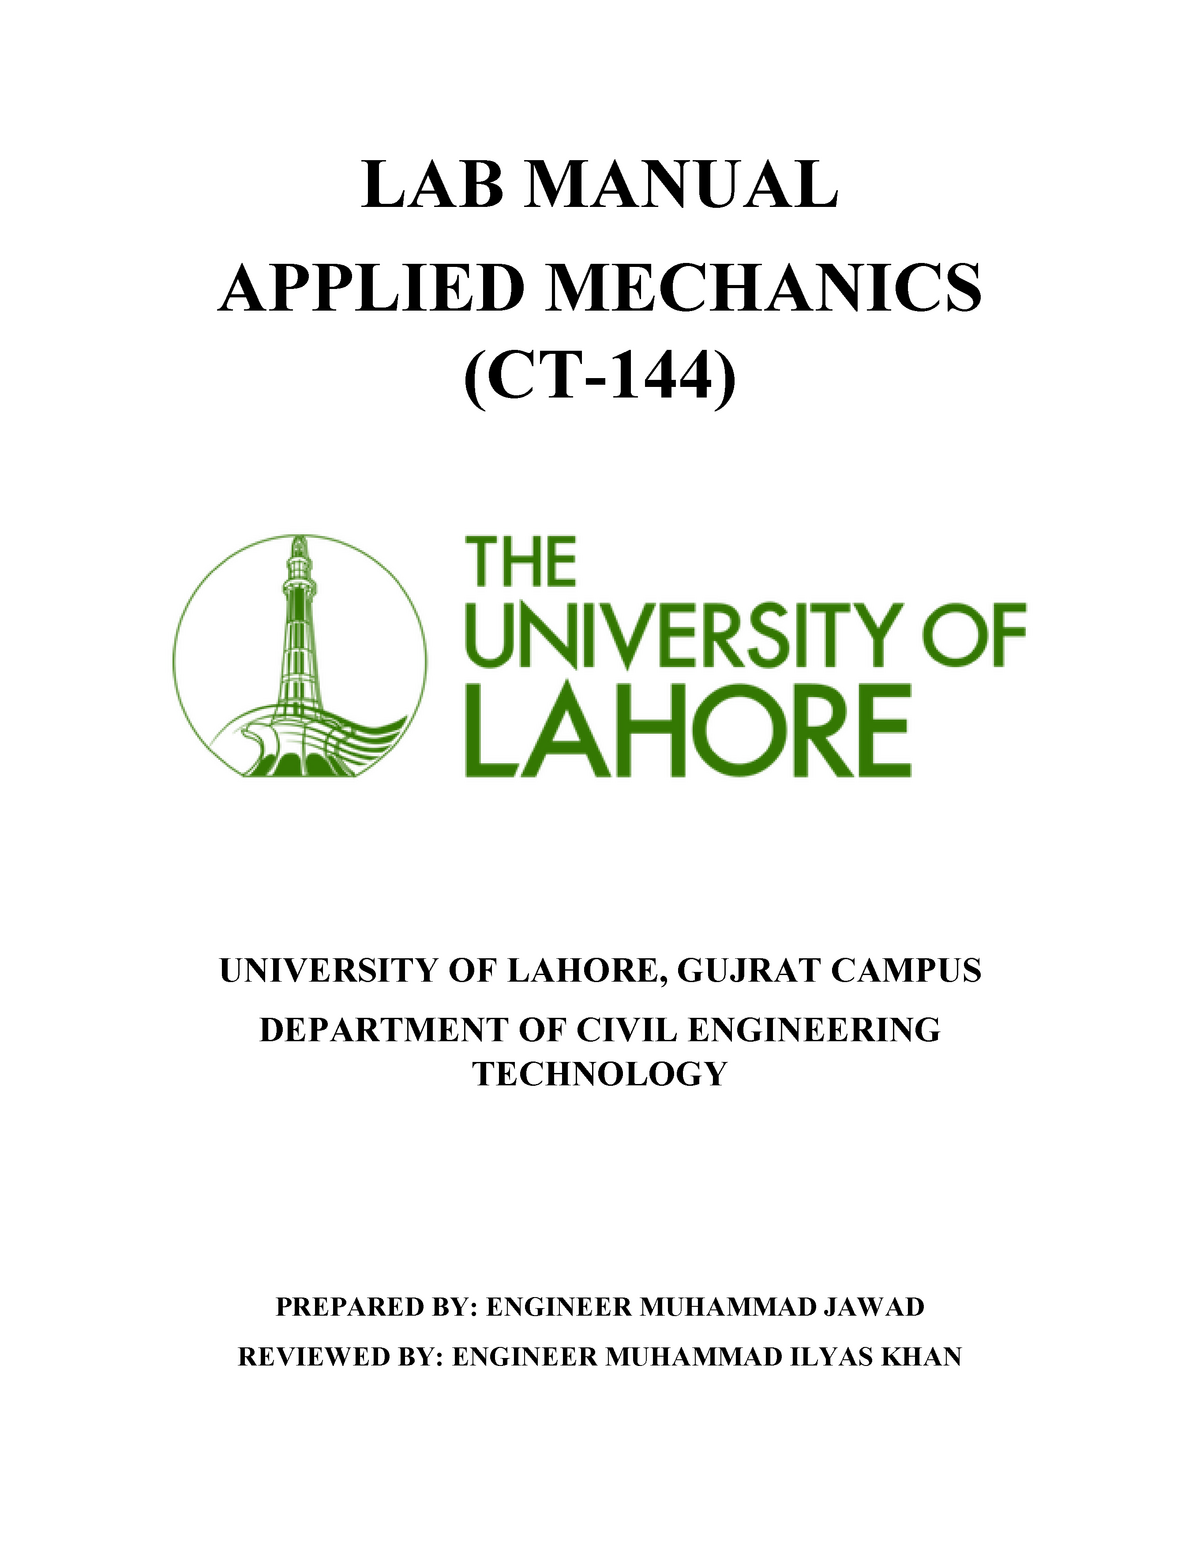 Applied Mechanics Lab Manual[ 1670] - CE-103: Civil